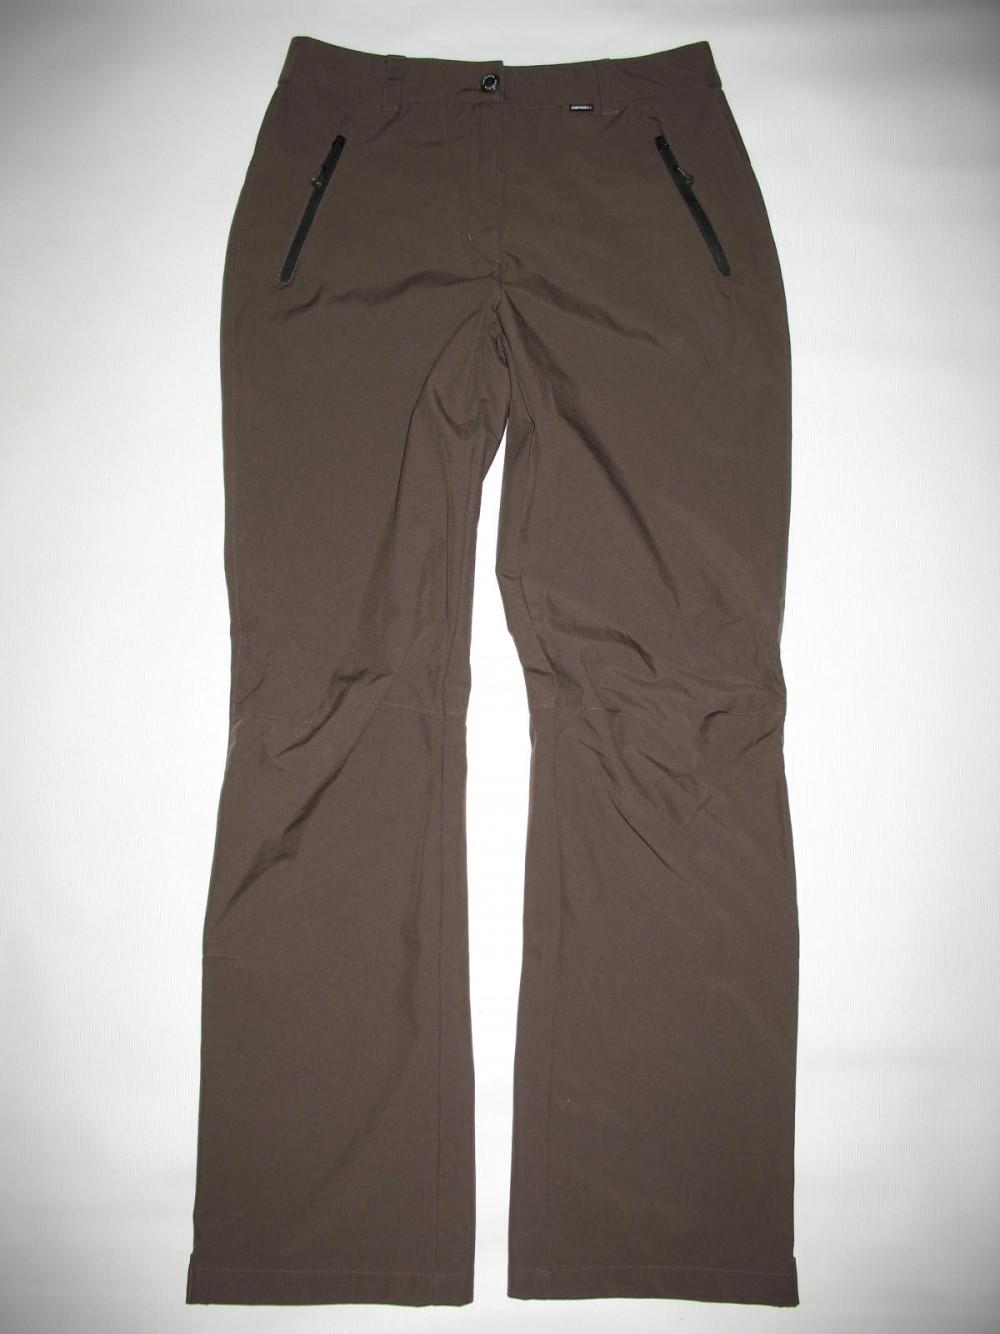 Штаны ICEPEAK softshell light pants lady (размер 36-S/M) - 1